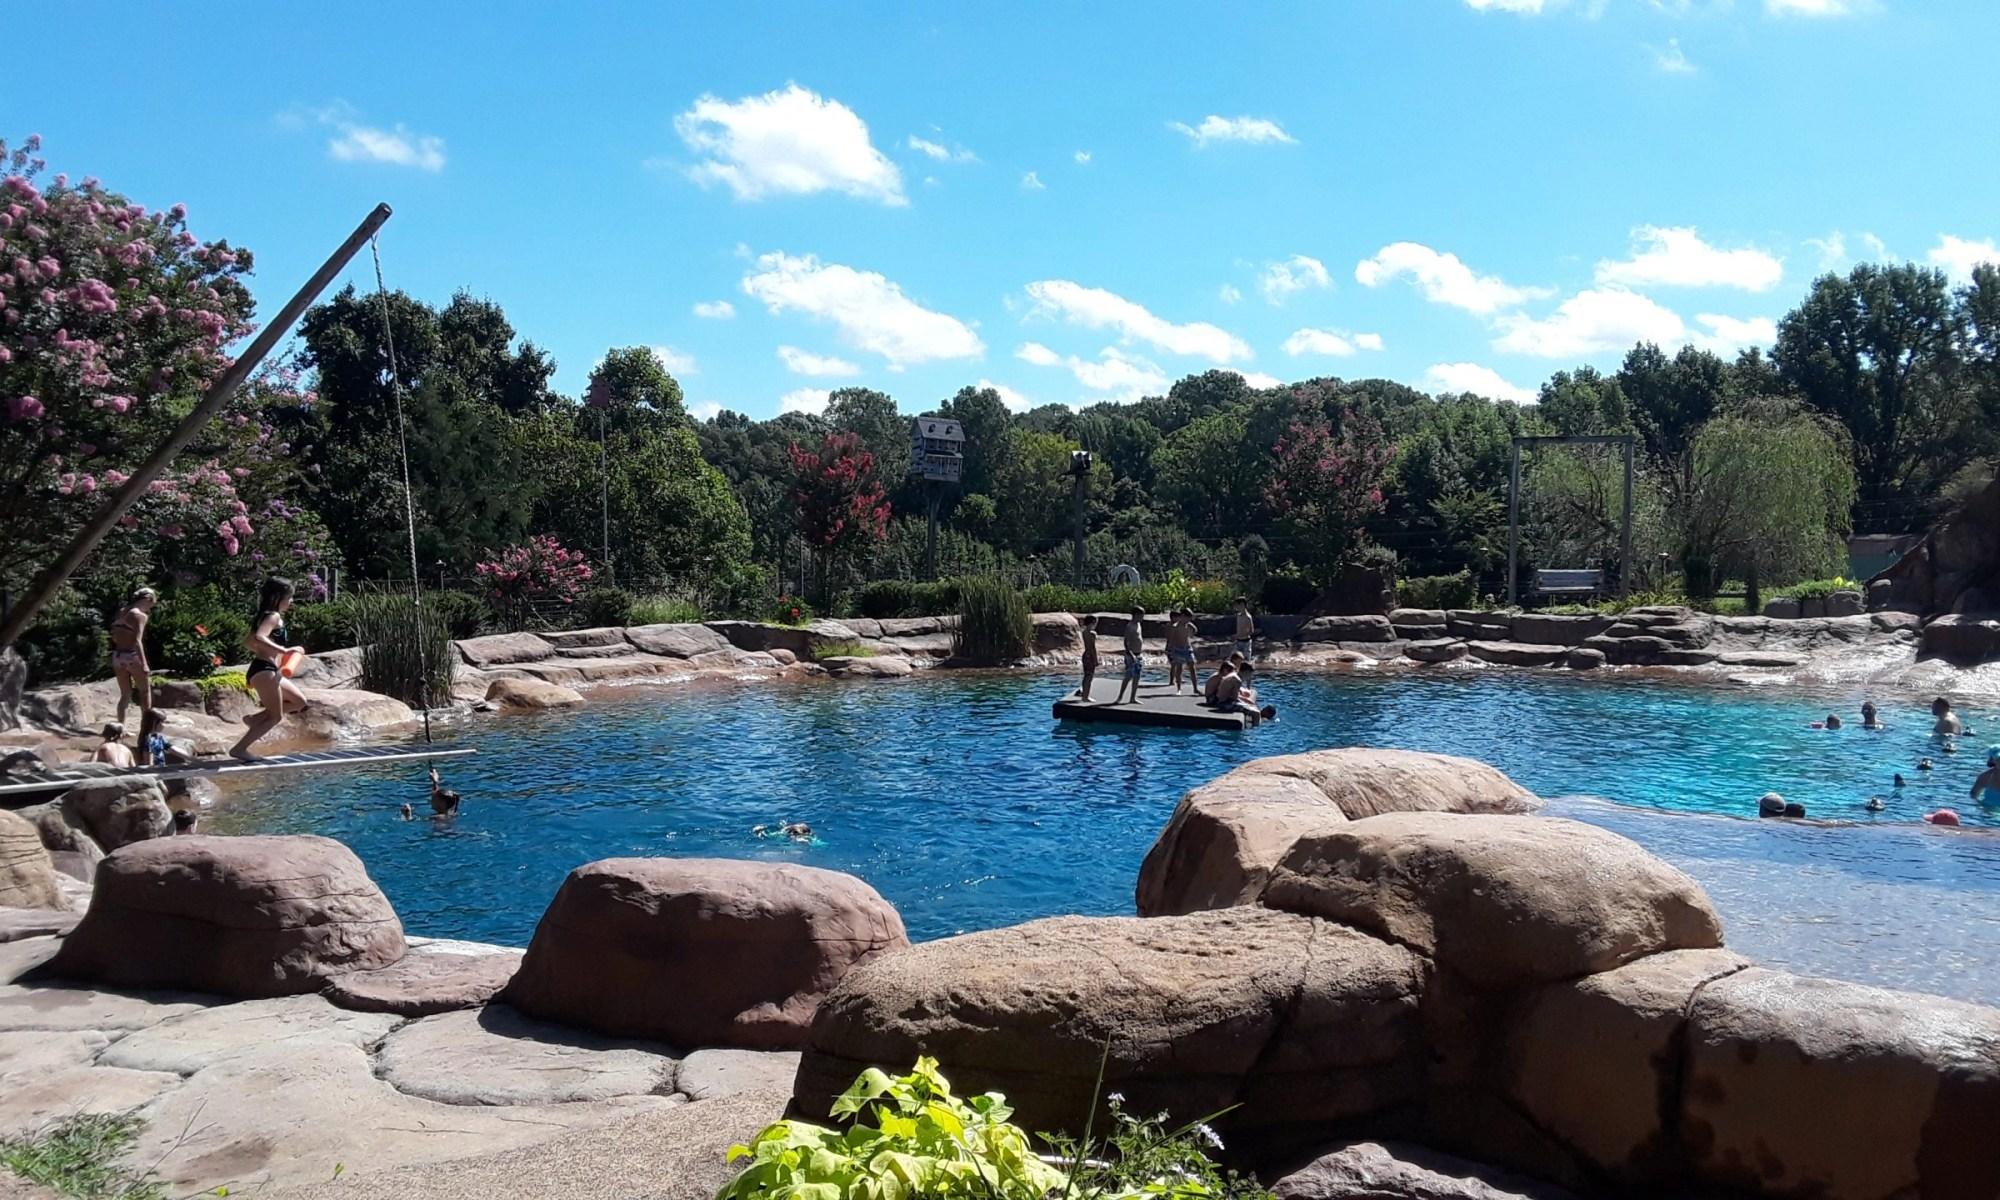 Thornton's Pool